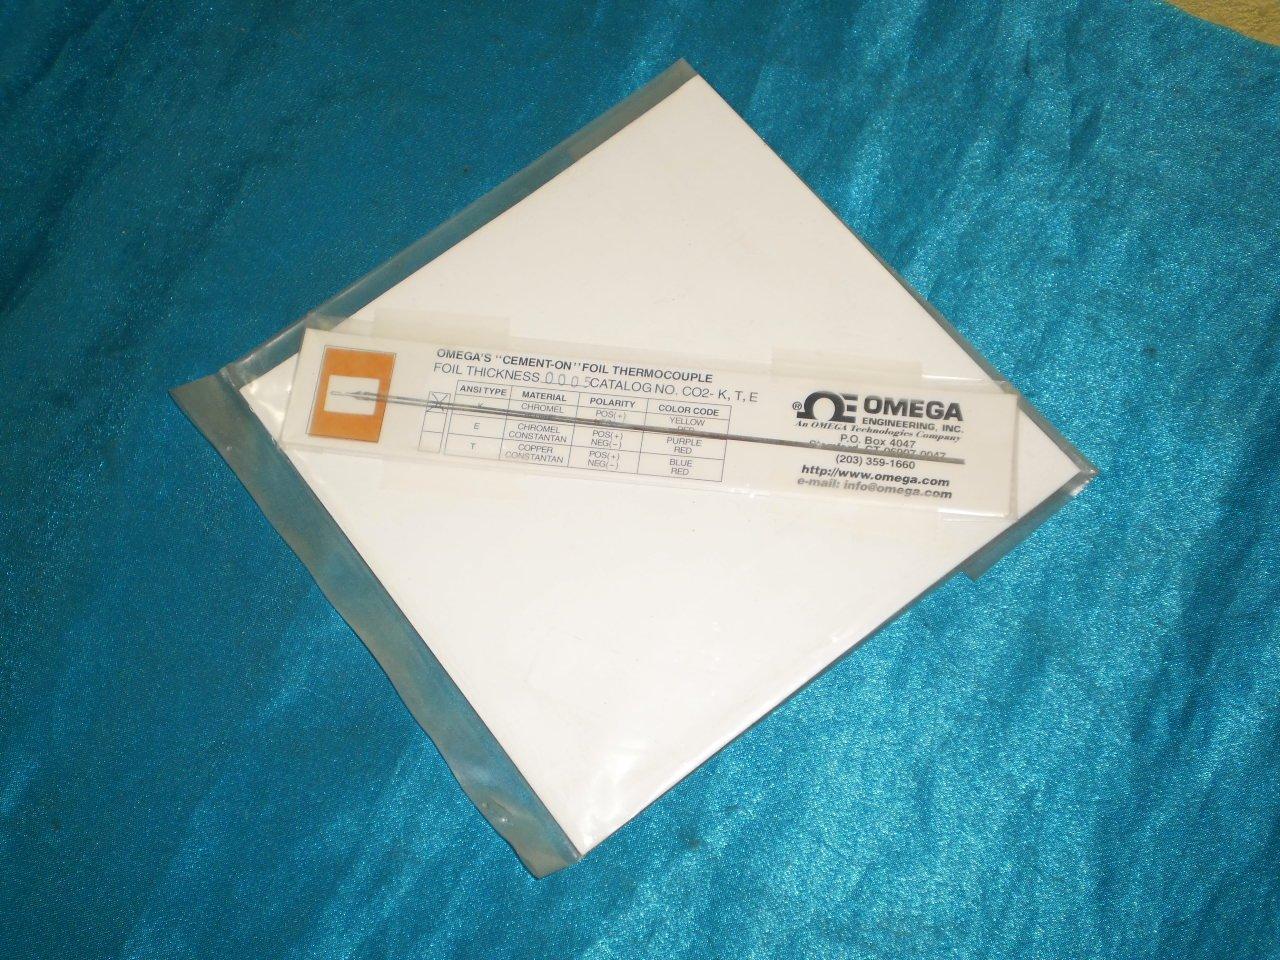 Omega C02-K Thermocouple